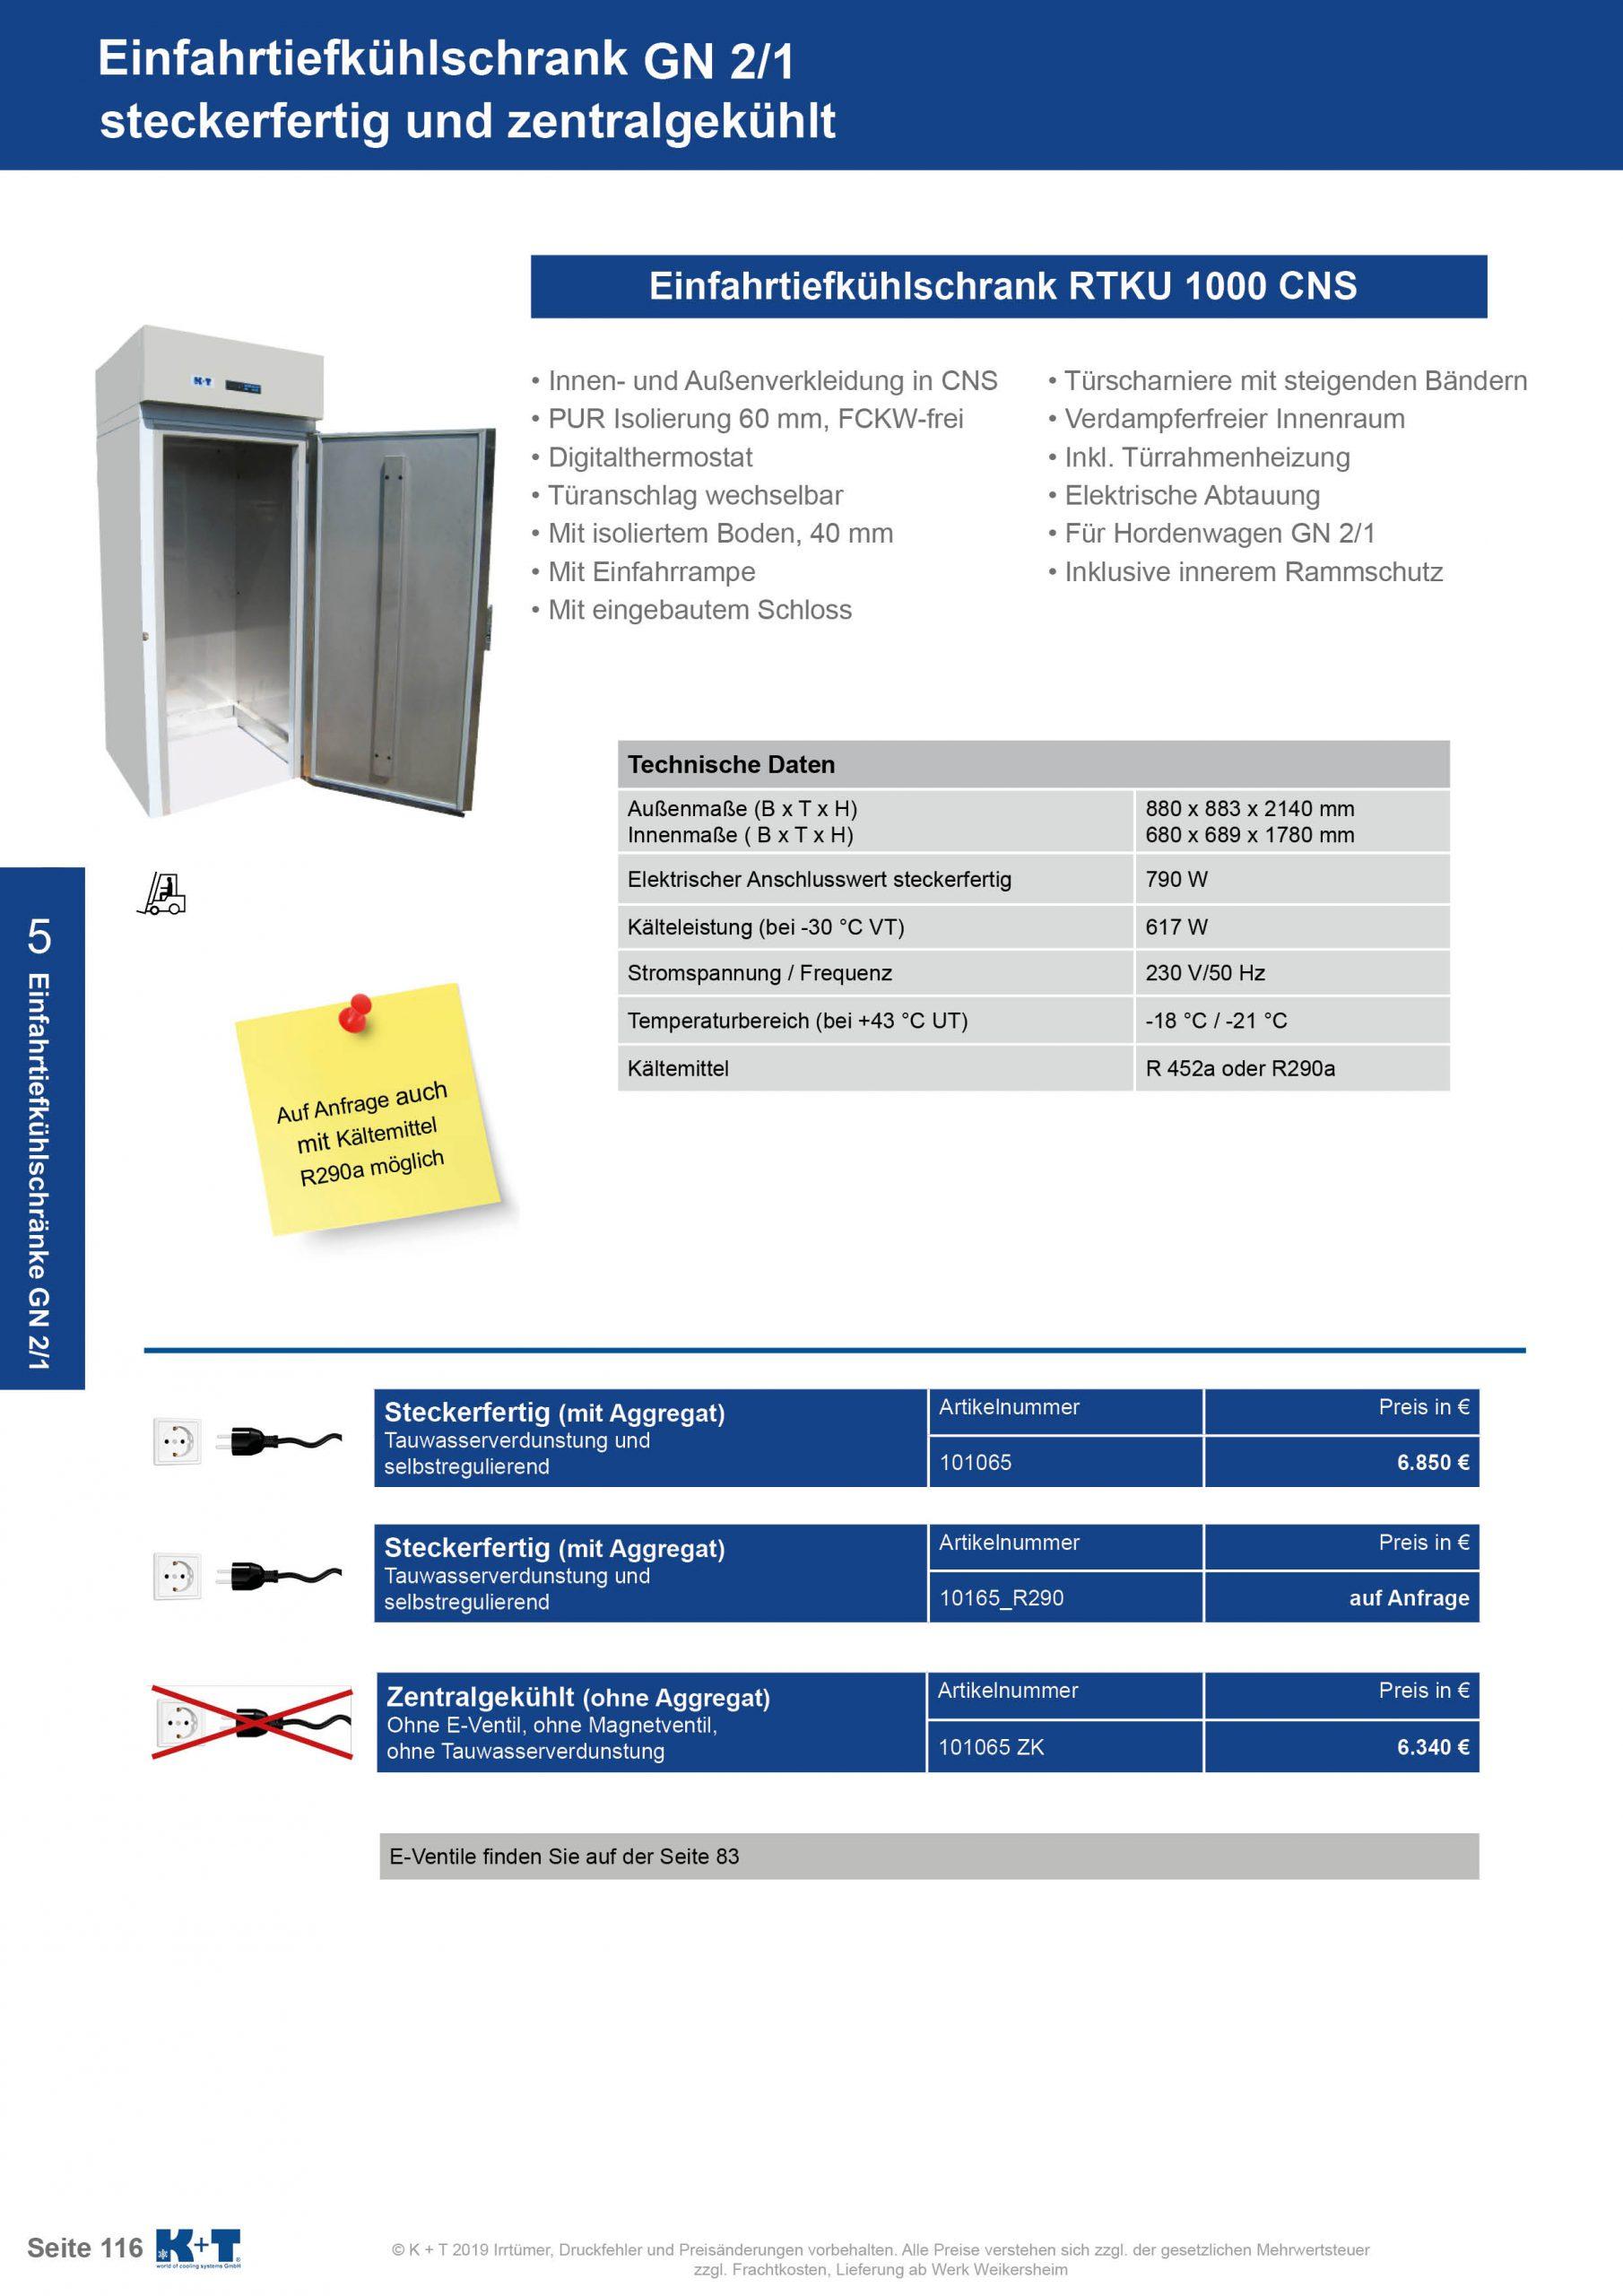 Einfahrtiefkühlschrank GN 2_1 zentralgekühlt